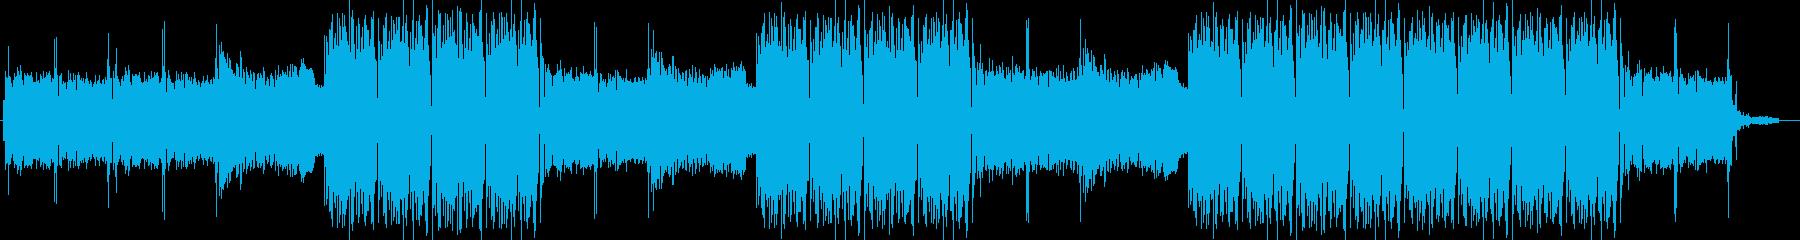 EDMクラブ系ダンスミュージック-09の再生済みの波形